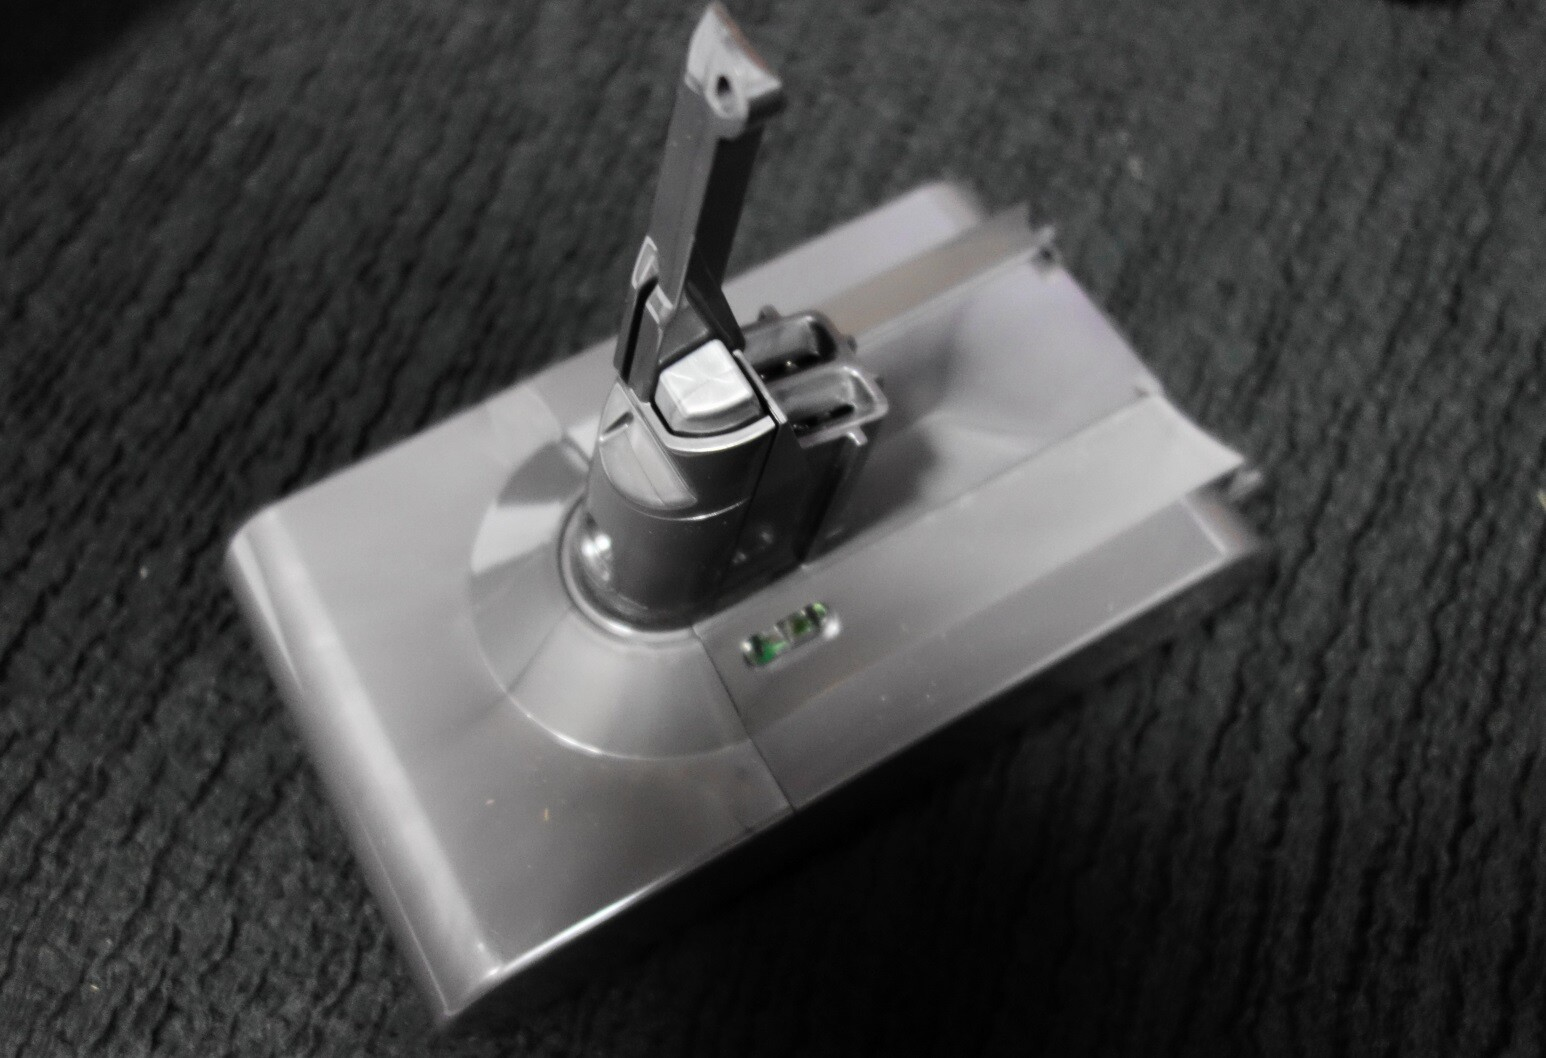 Dyson掃除機のバッテリー